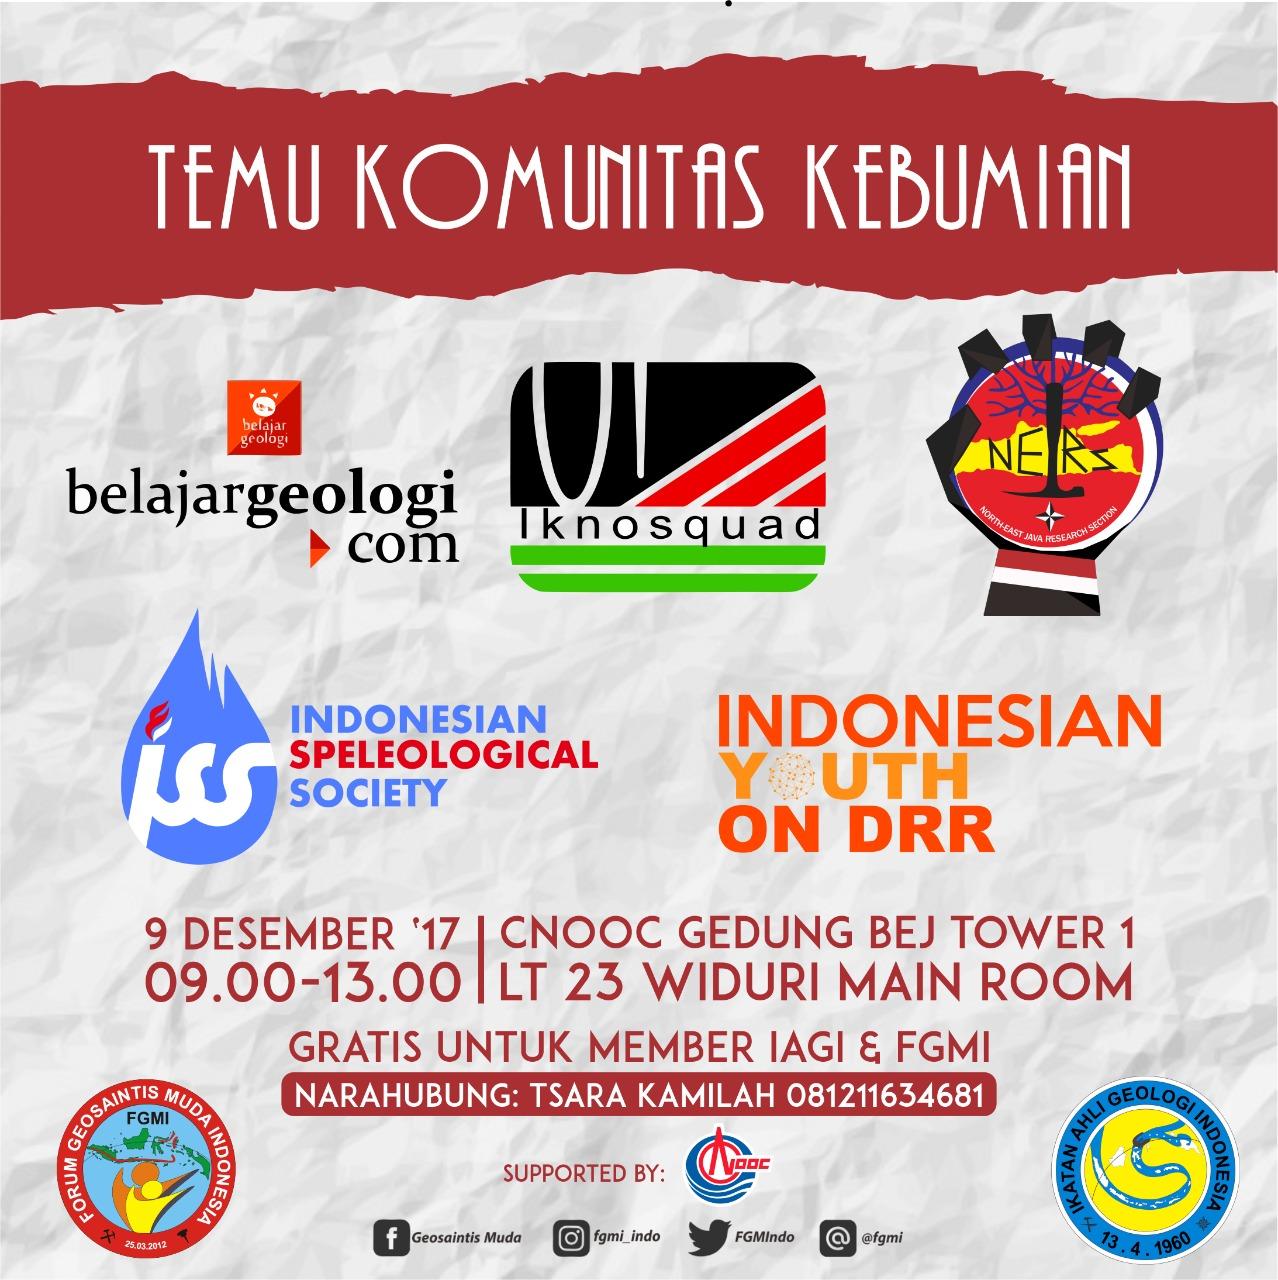 fgmi_komunitas_kebumian_20171209